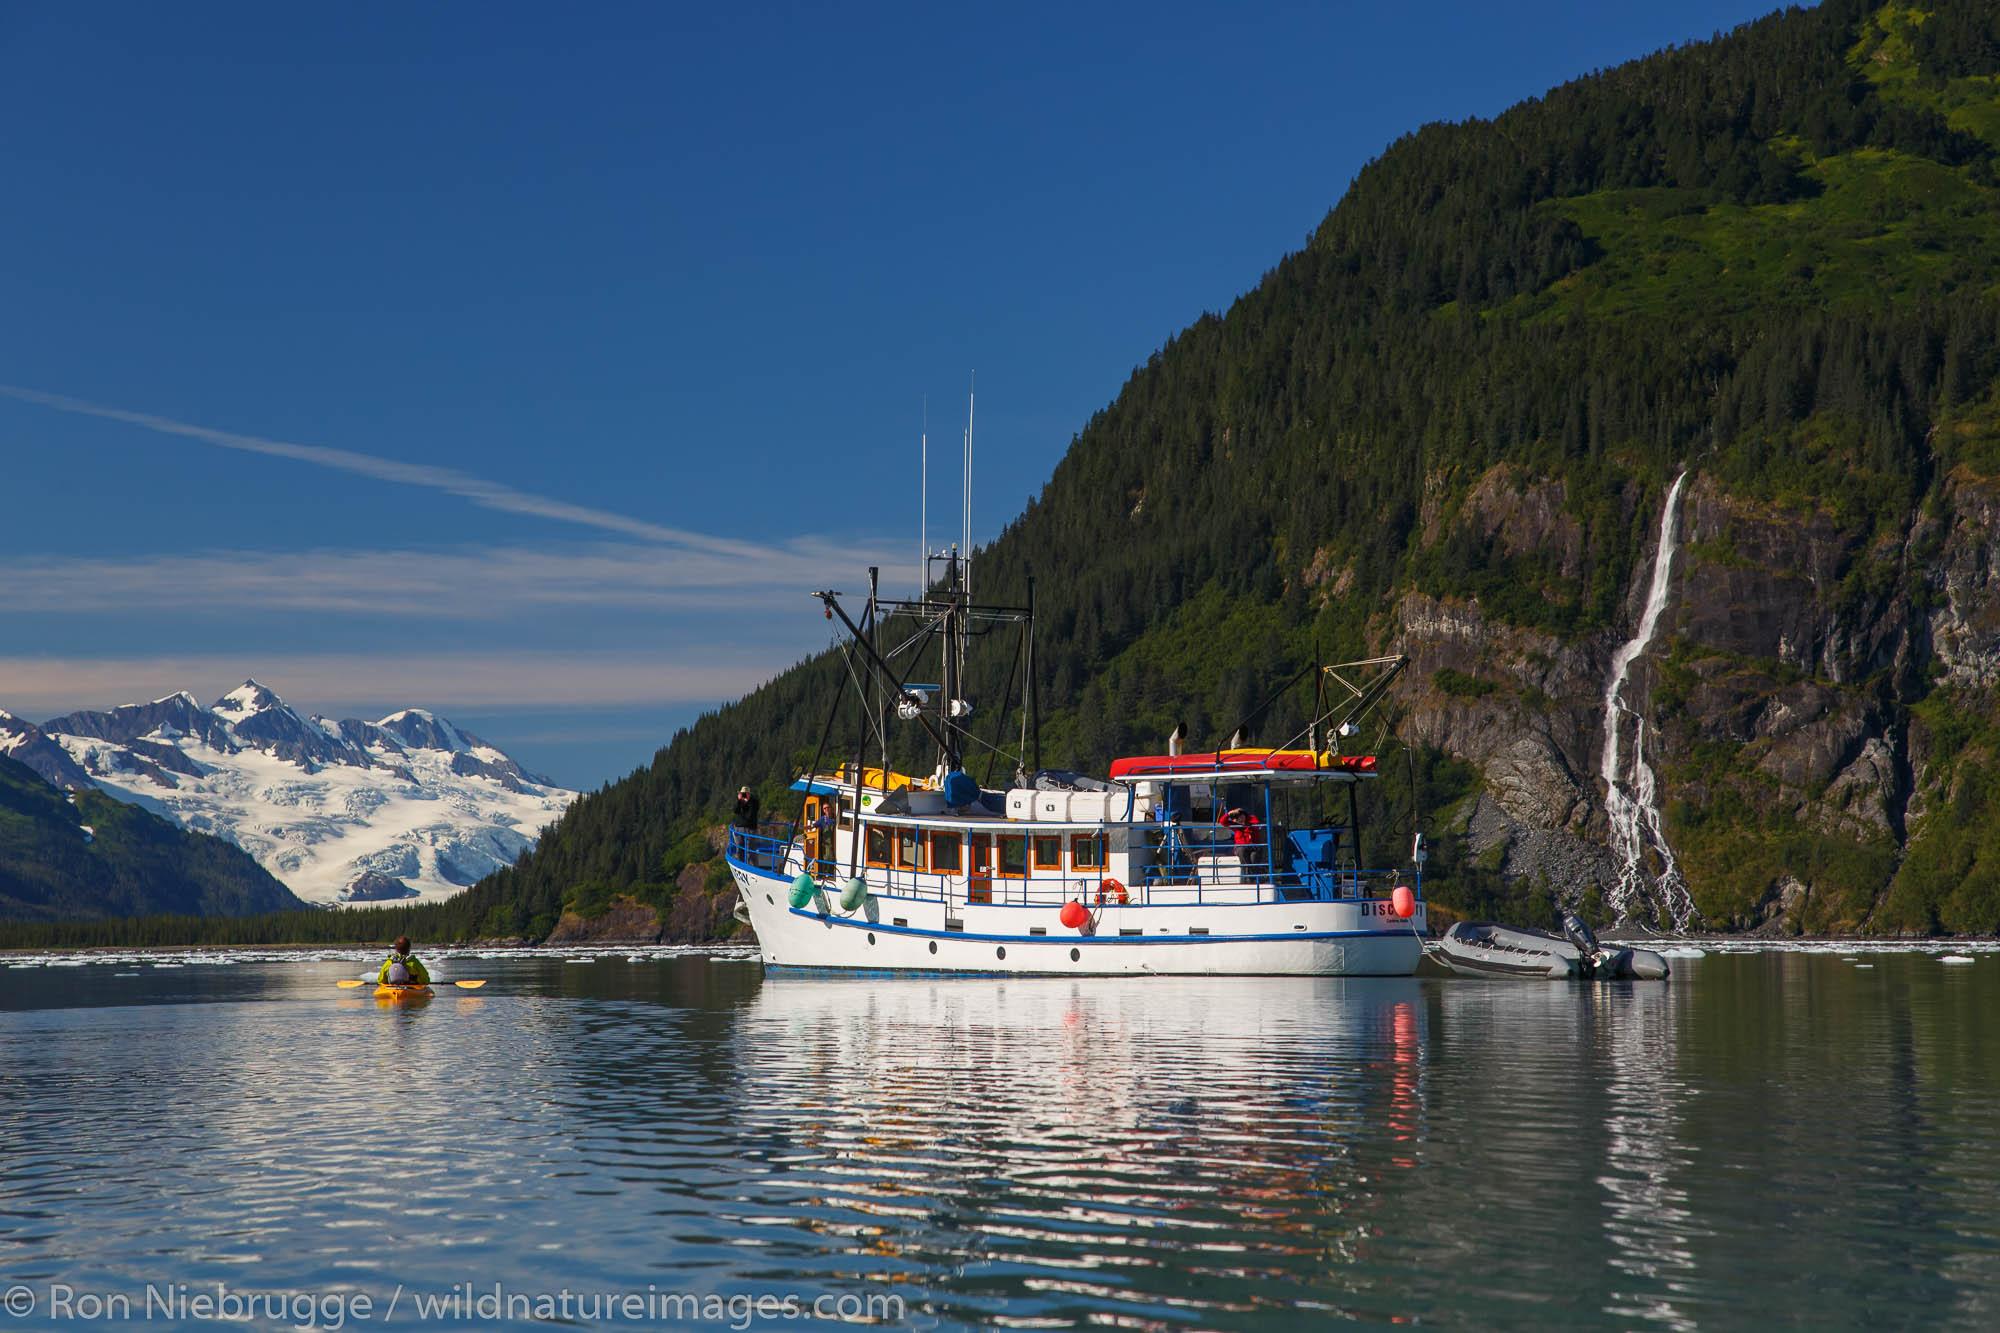 Kayaking in Harriman Fjord, Prince William Sound, Chugach National Forest, Alaska.